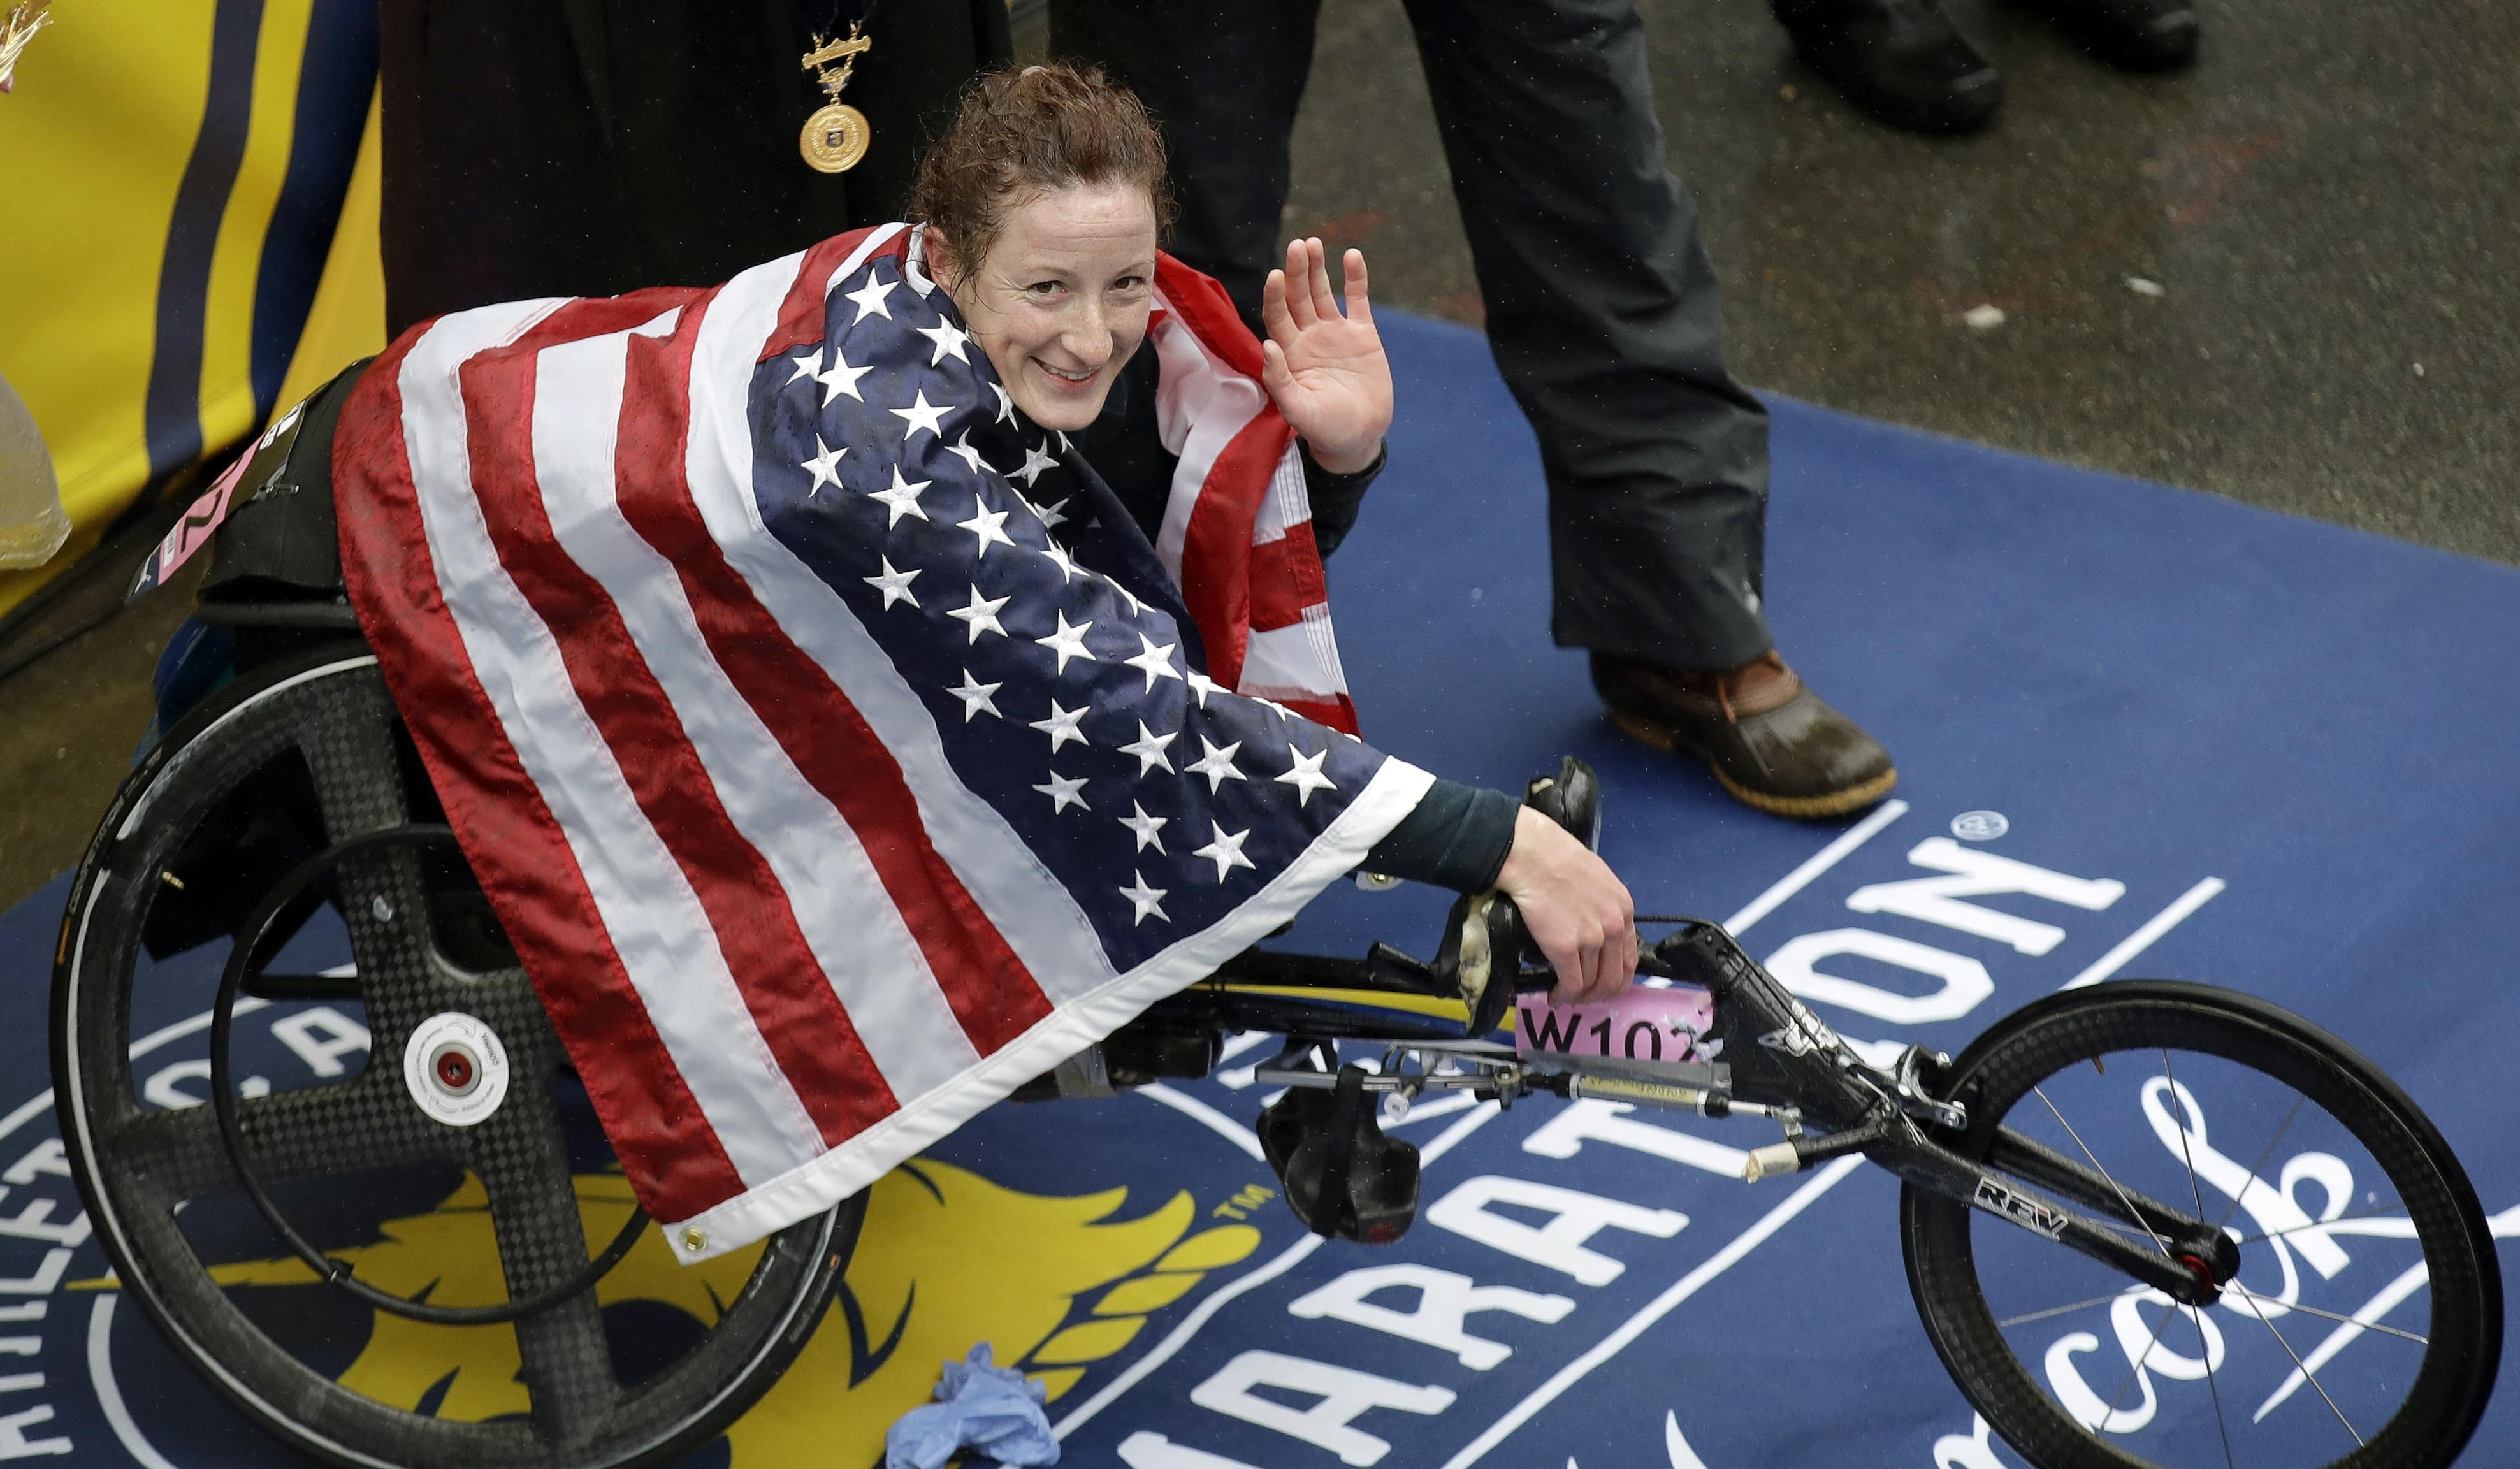 U of I graduate Tatyana McFadden, celebrates after winning the women's wheelchair division of the 122nd Boston Marathon.